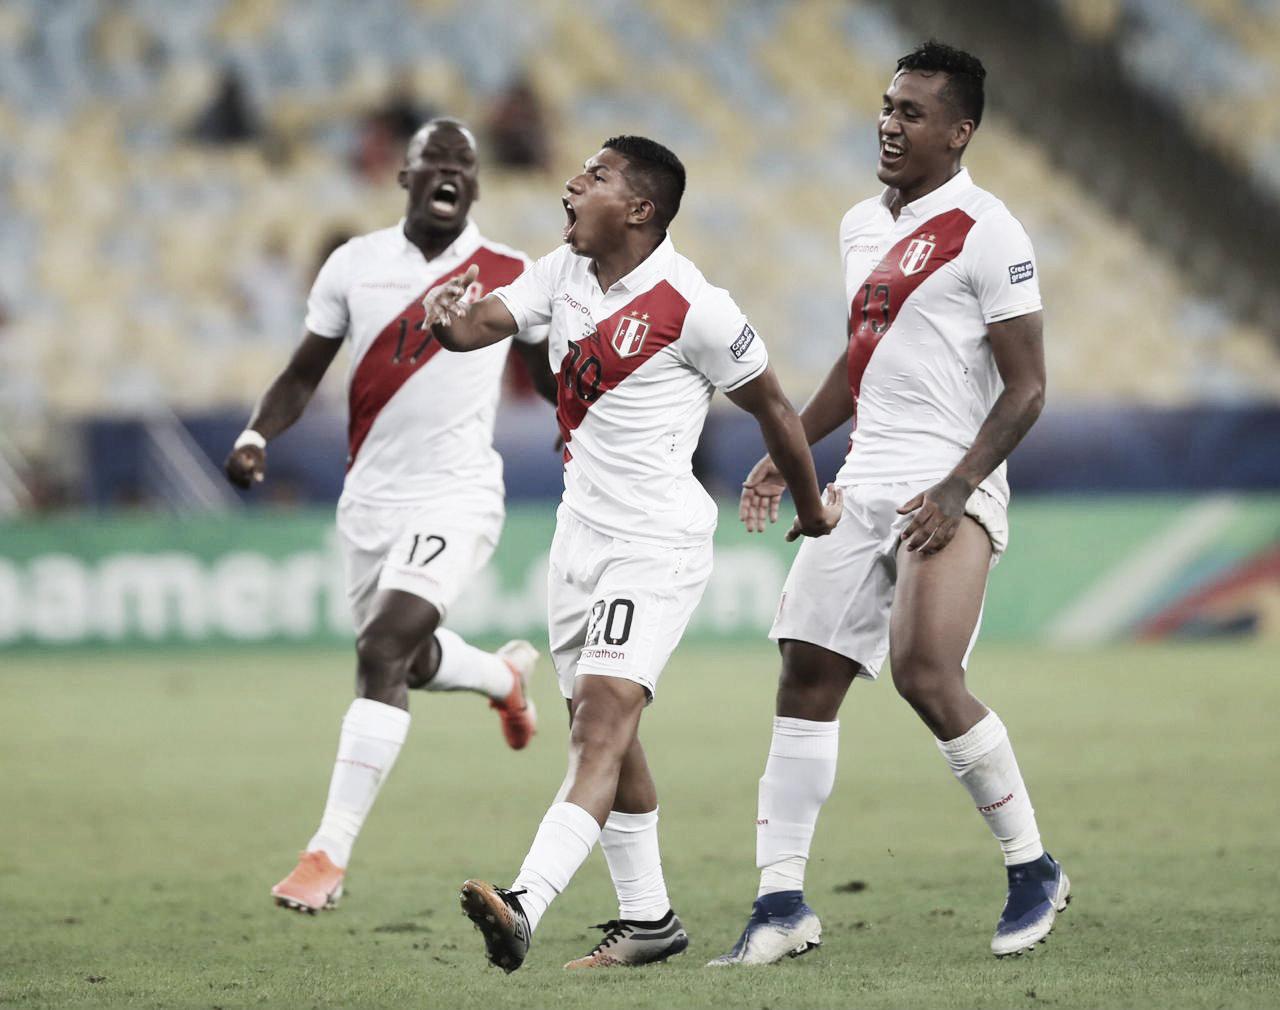 Perú deleitó con una épica remontada